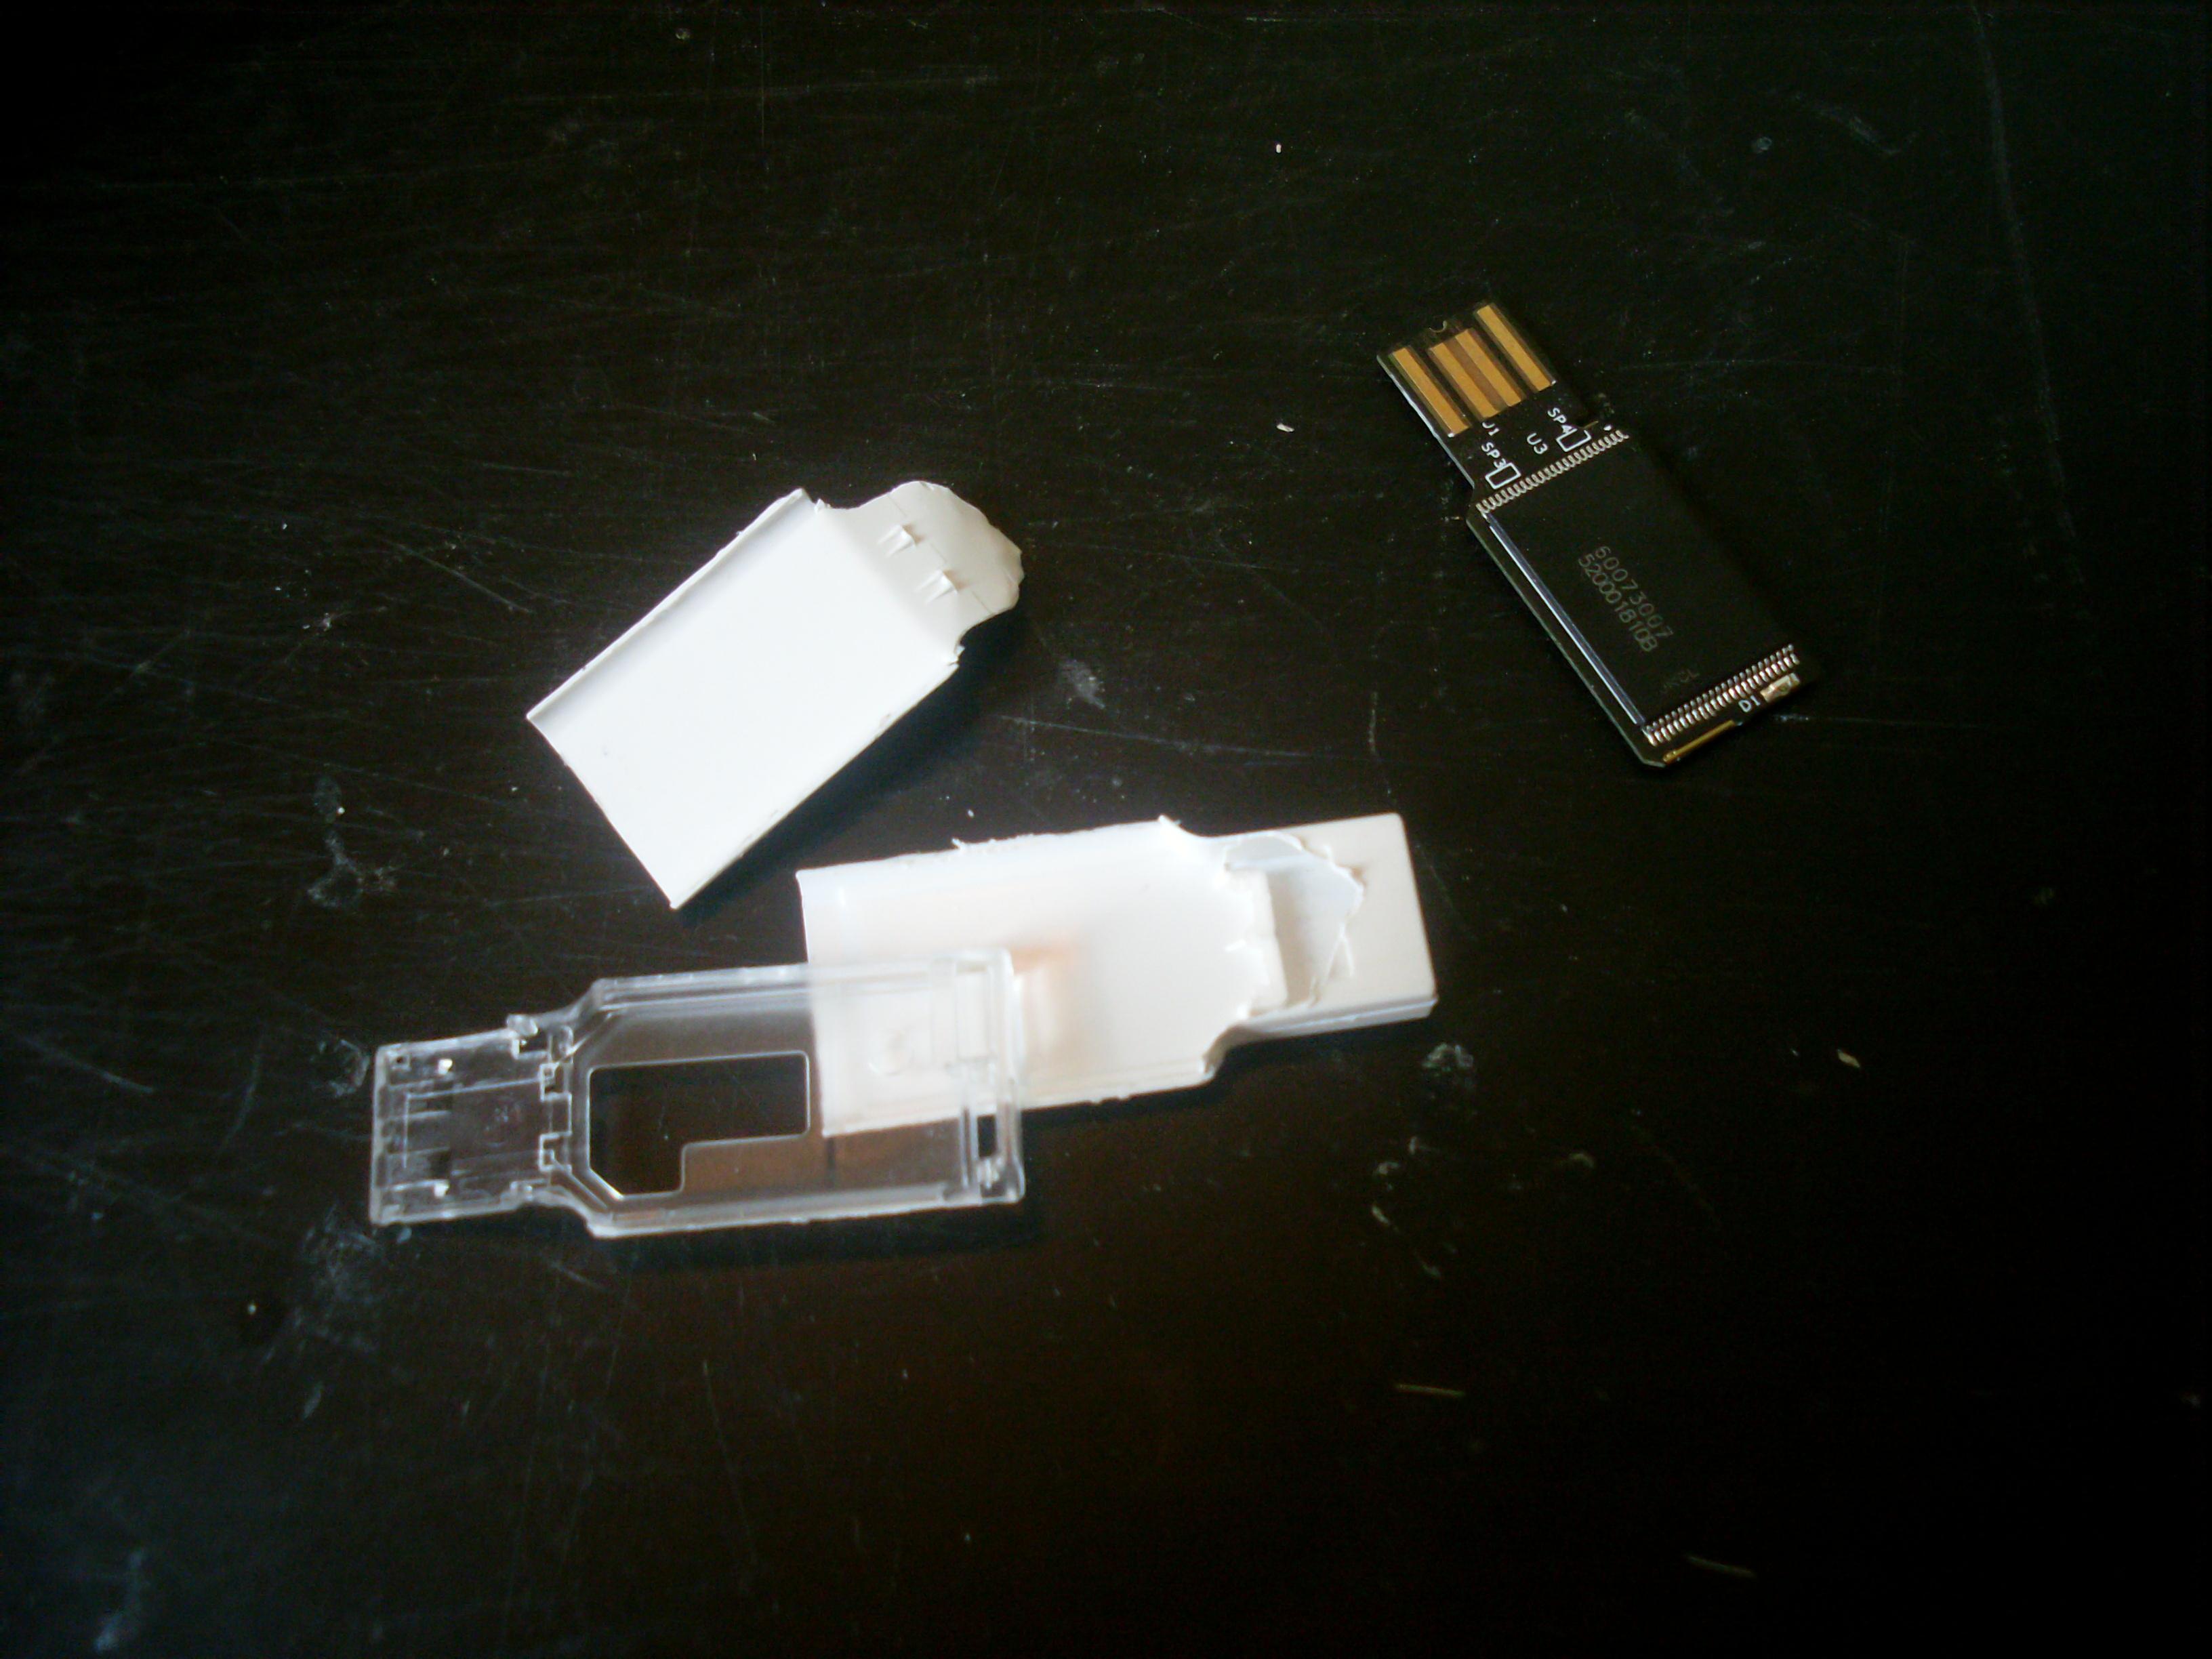 Get an Ultra-Slim USB Stick DeadDropReady